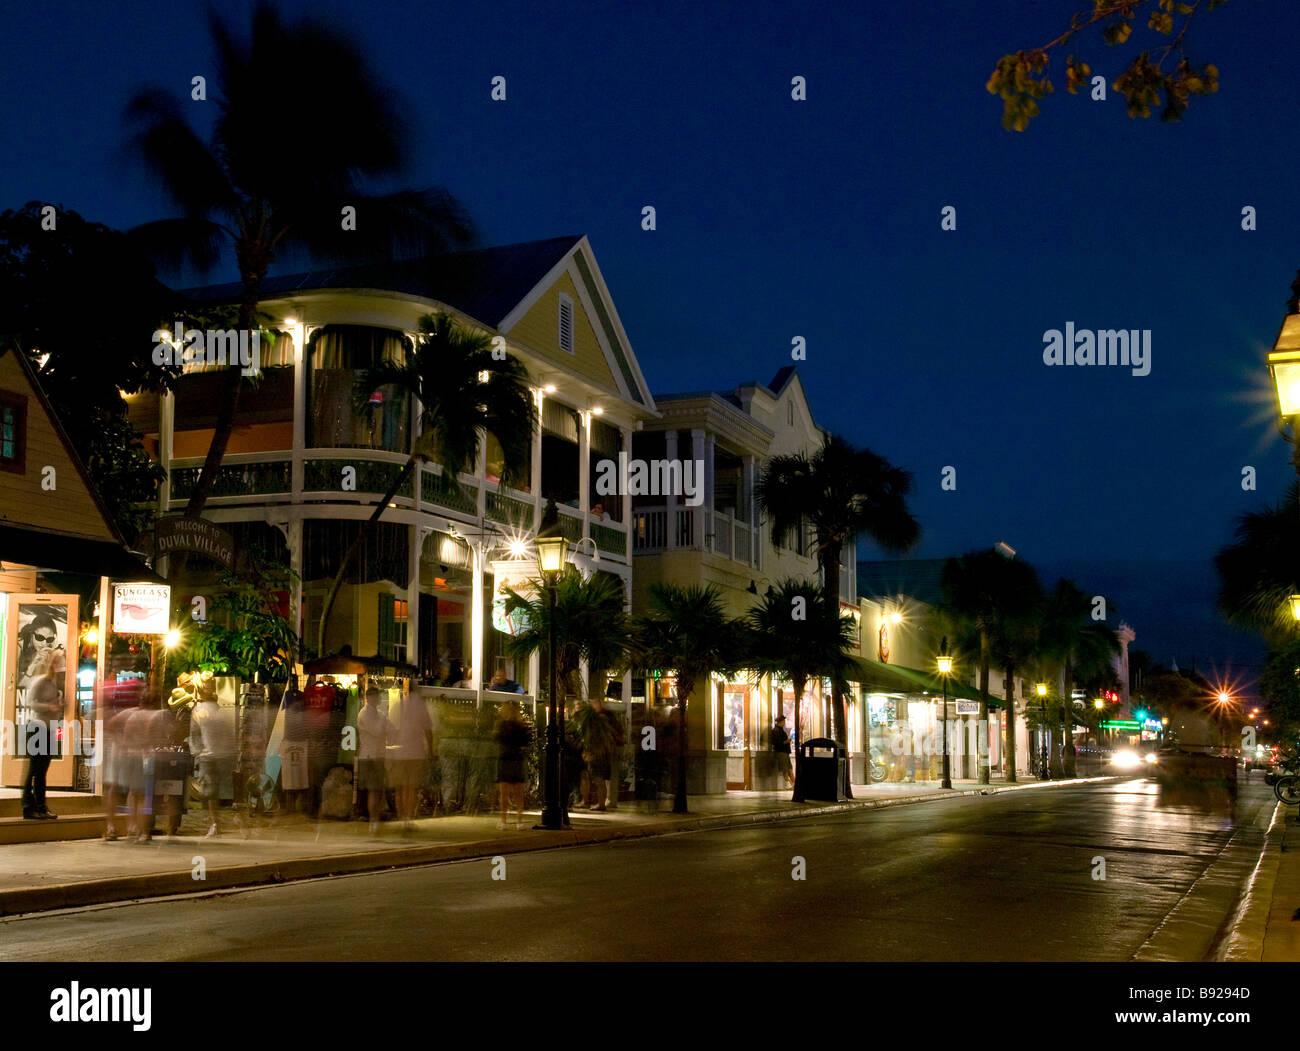 Duval Street Key West FL at night - Stock Image